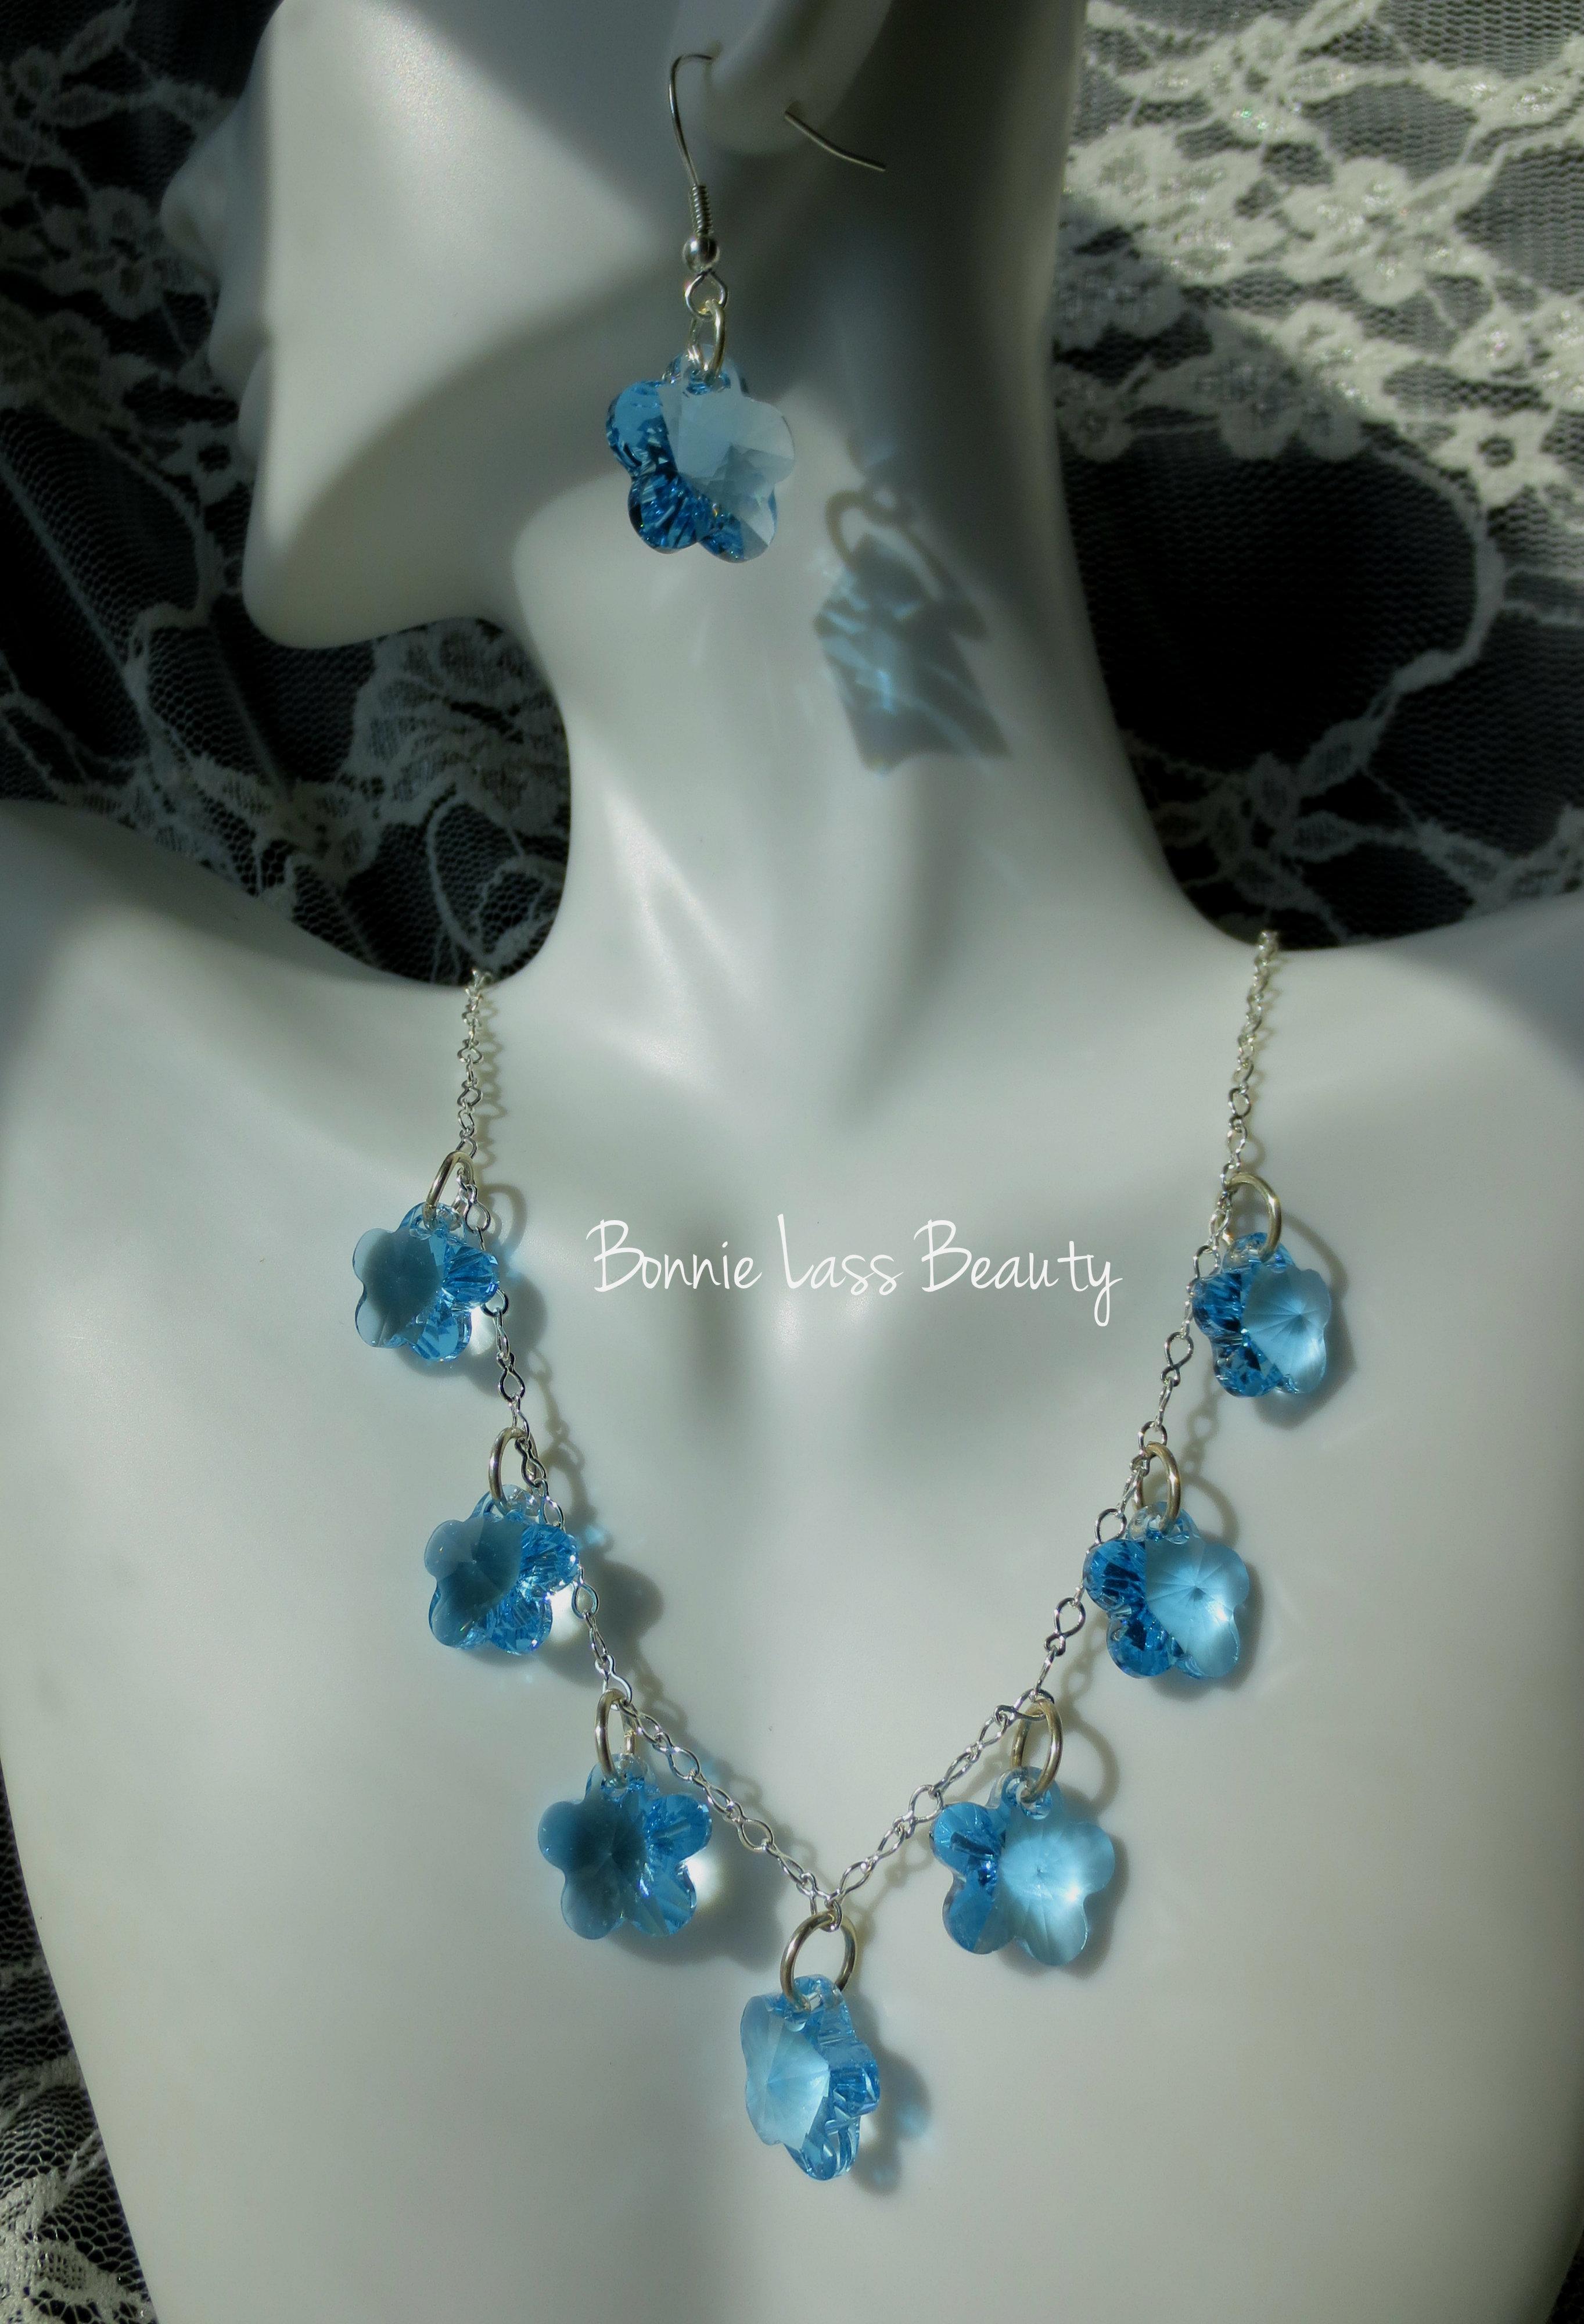 0194fd4e3 Blue Swarovski Crystal Flower Necklace and Earring set · Bonnie Lass ...